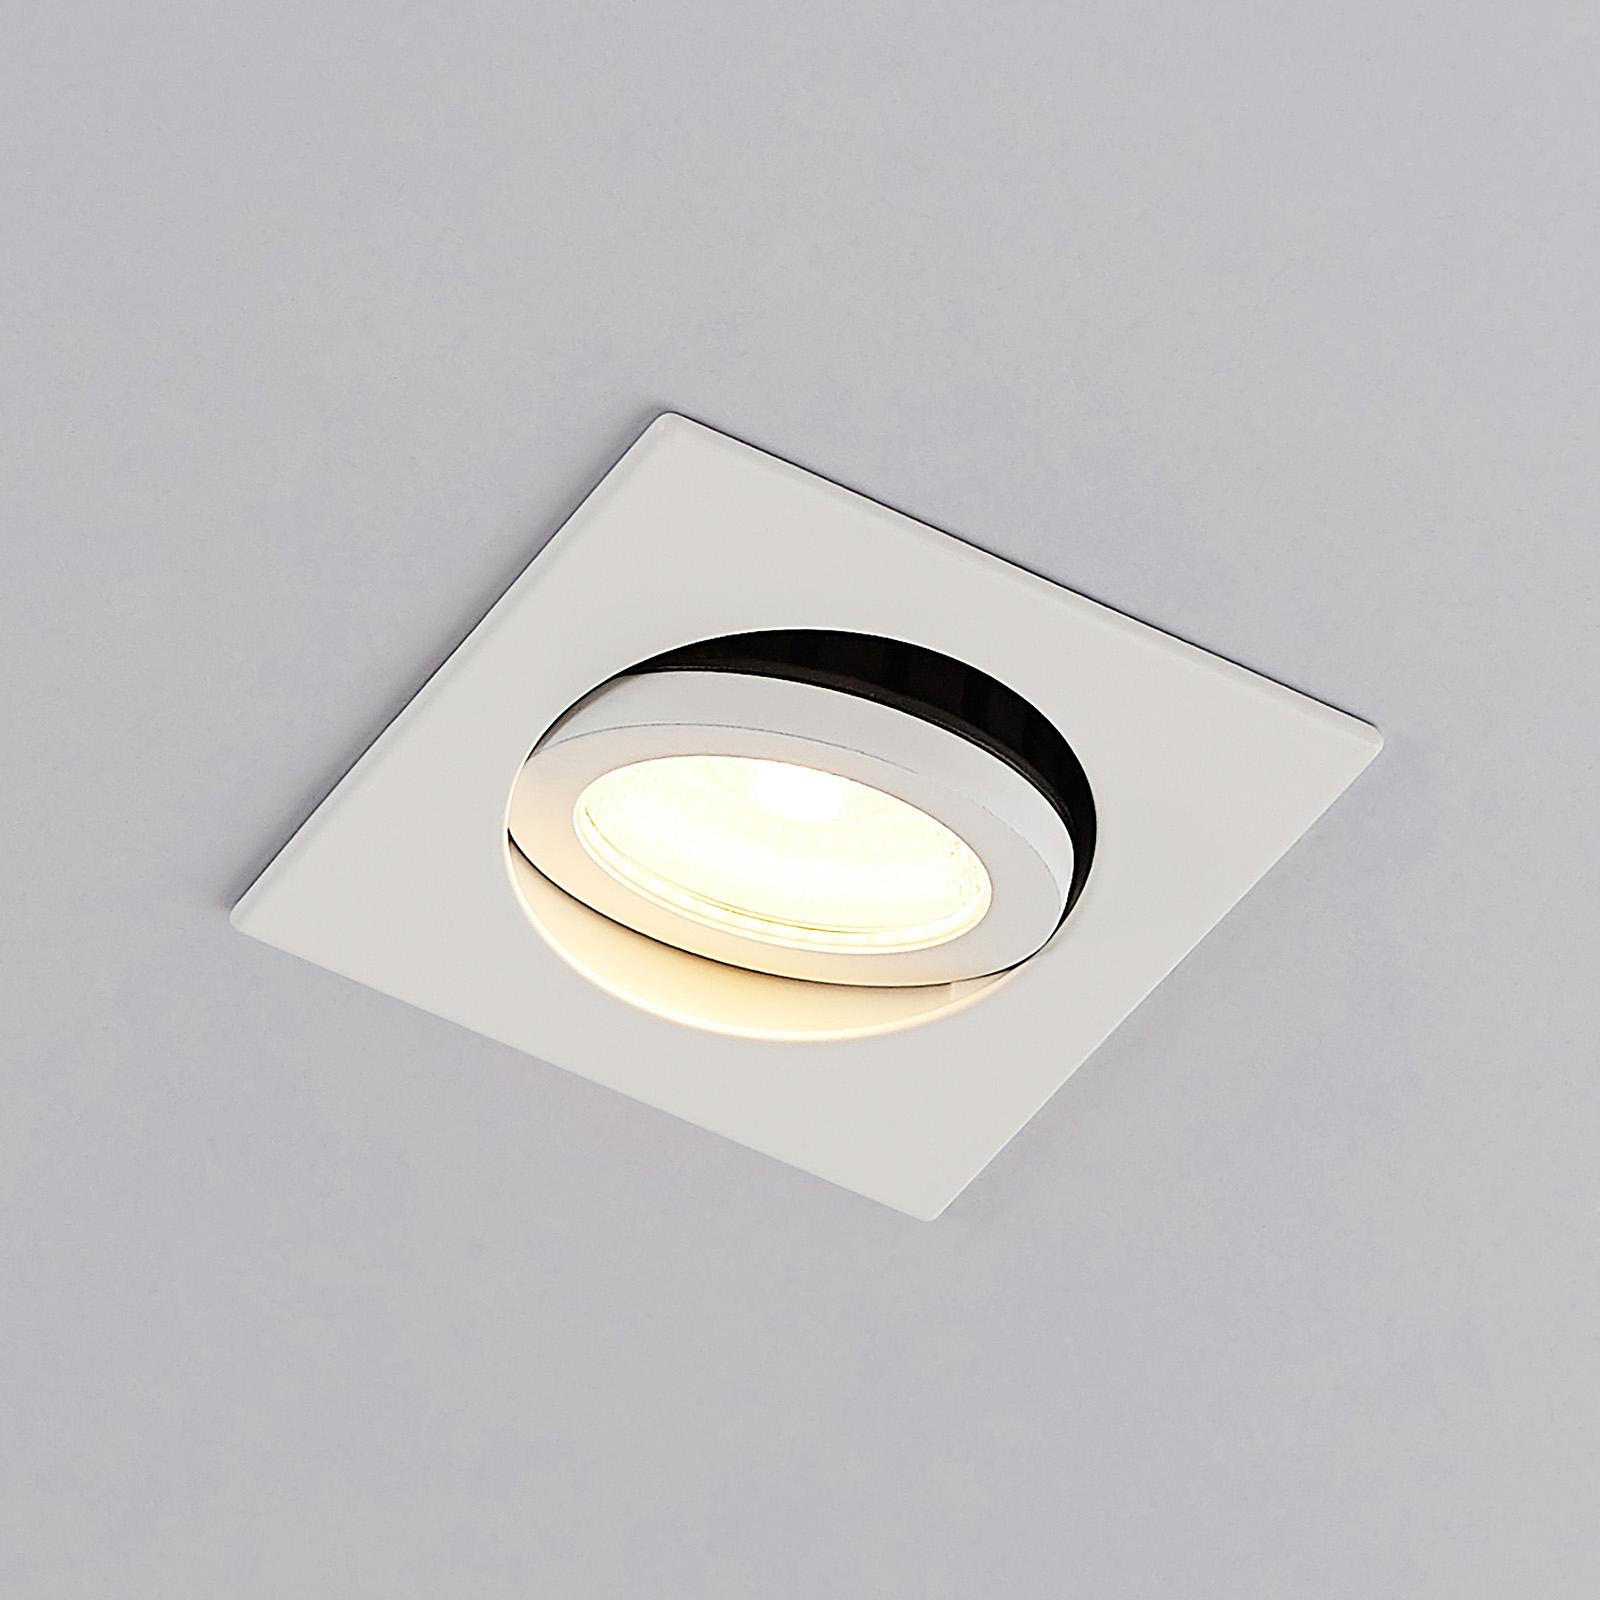 Arcchio Dacio LED-downlight kant 36°, IP65, 4W